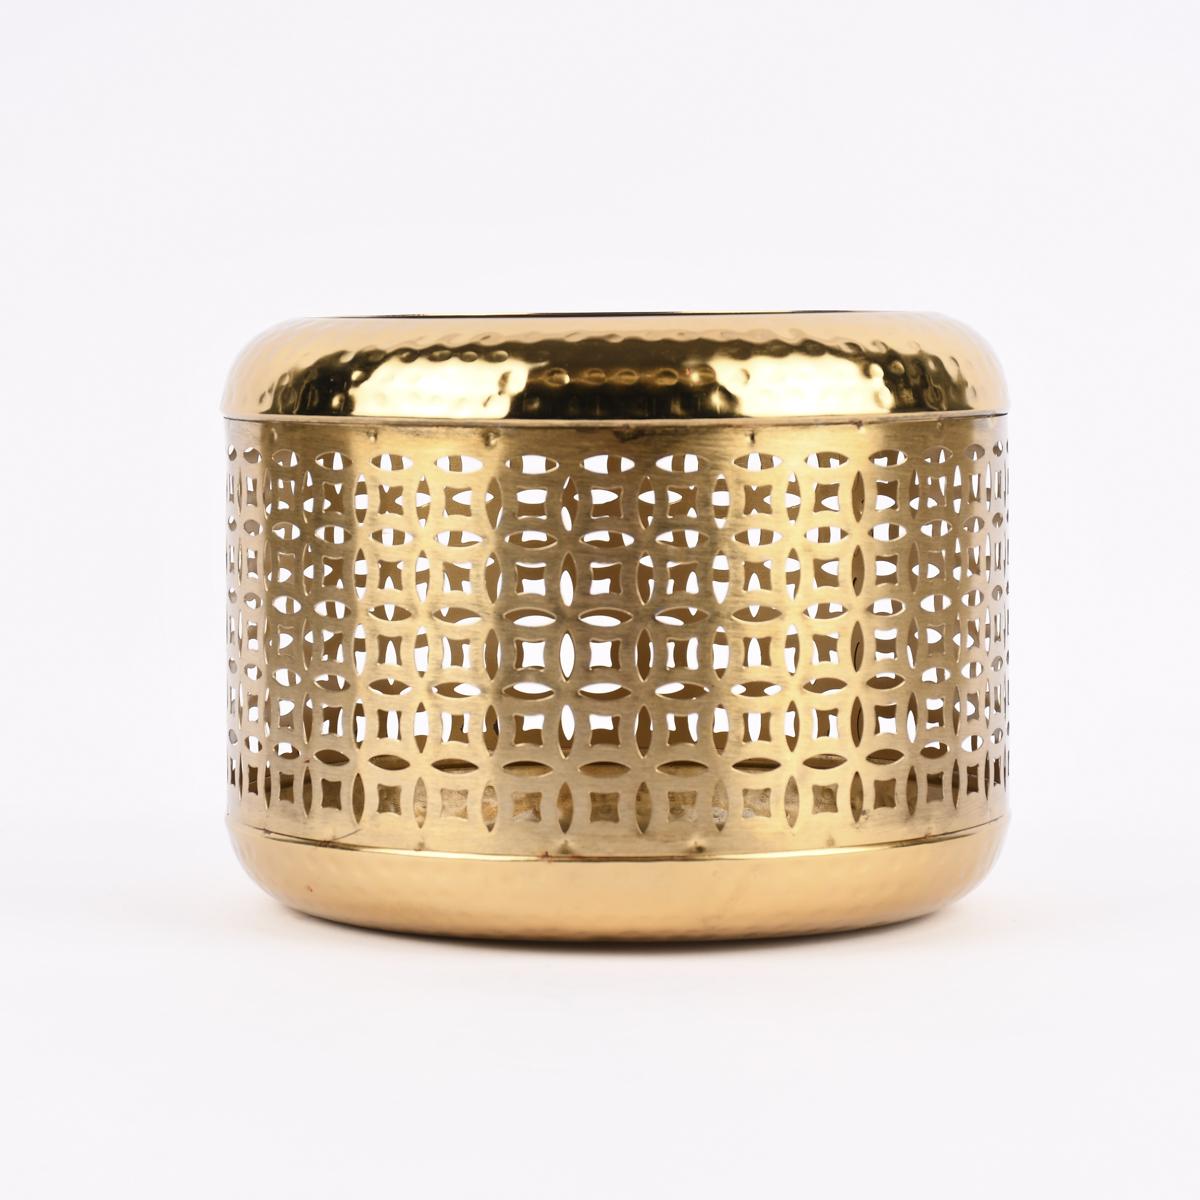 Laterne Ornamente Metall perforiert goldfarbig 24x19cm